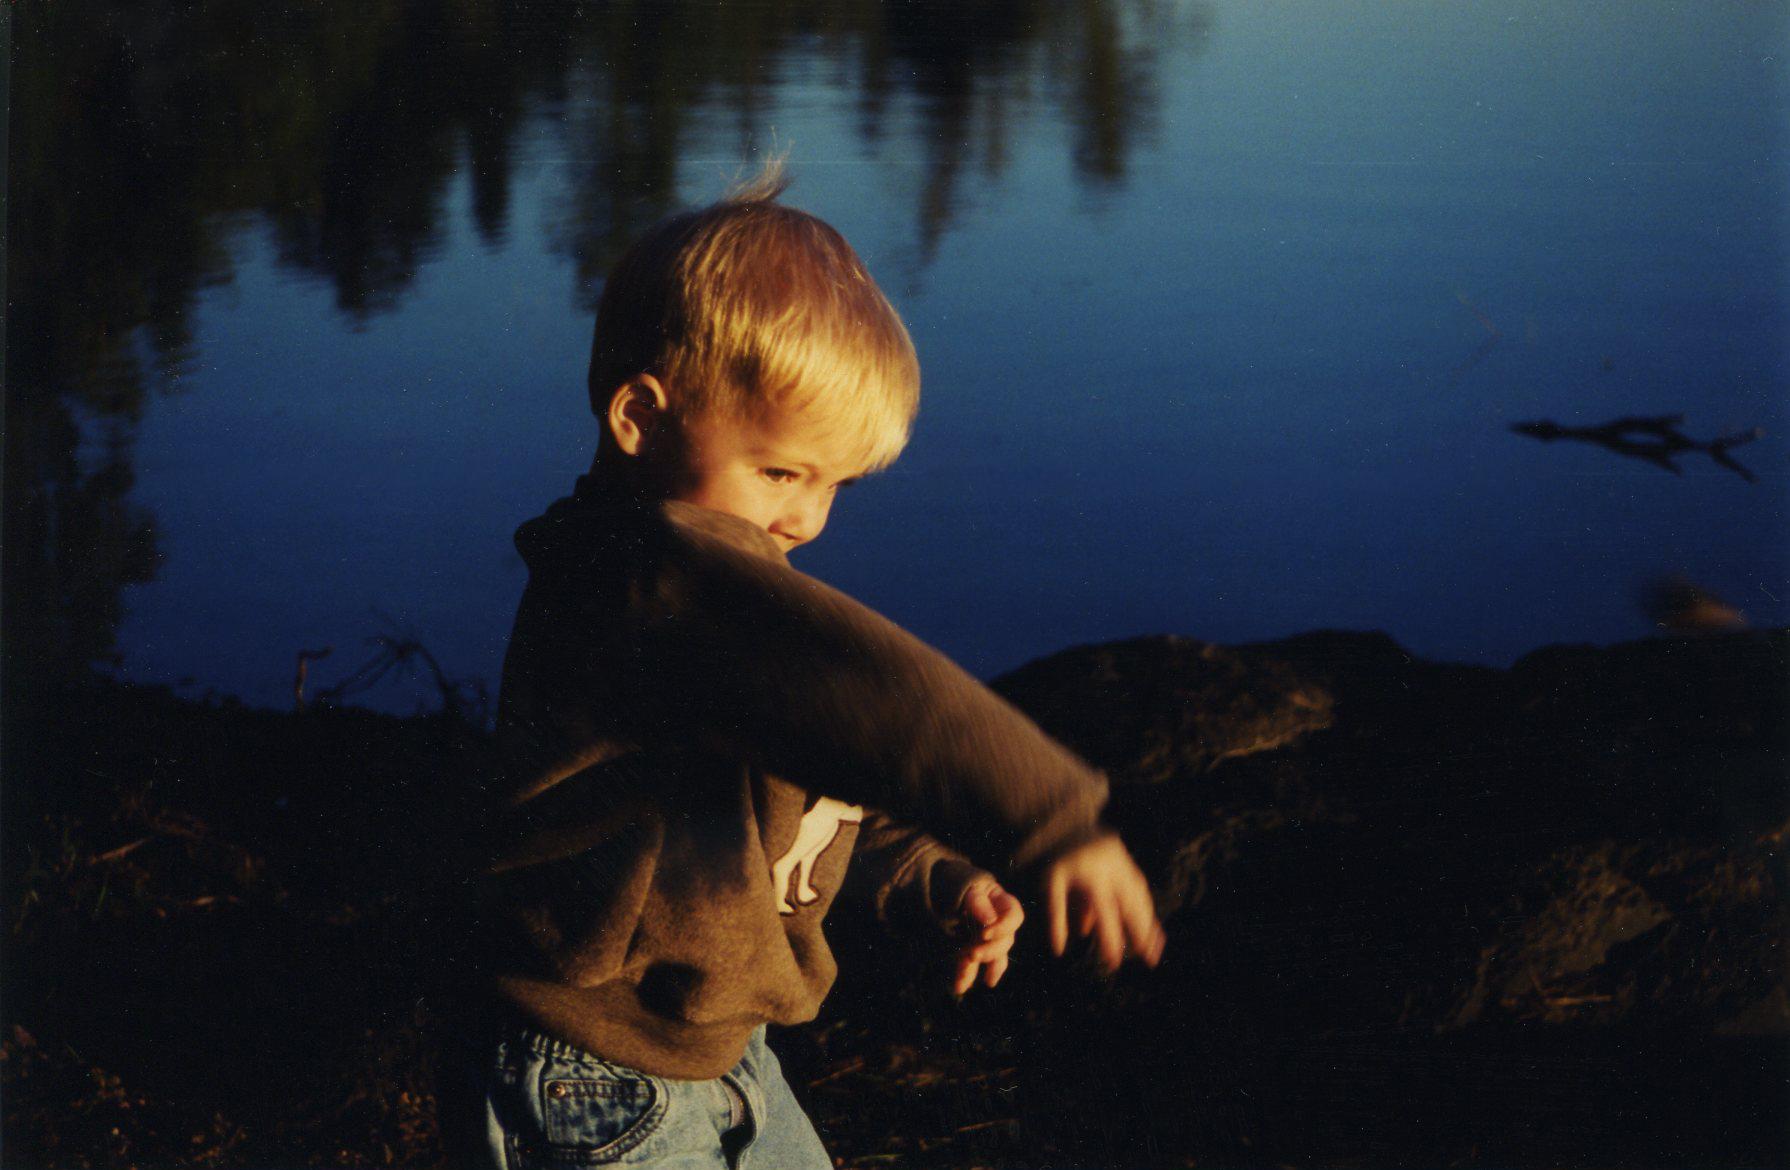 Cody-NB1997